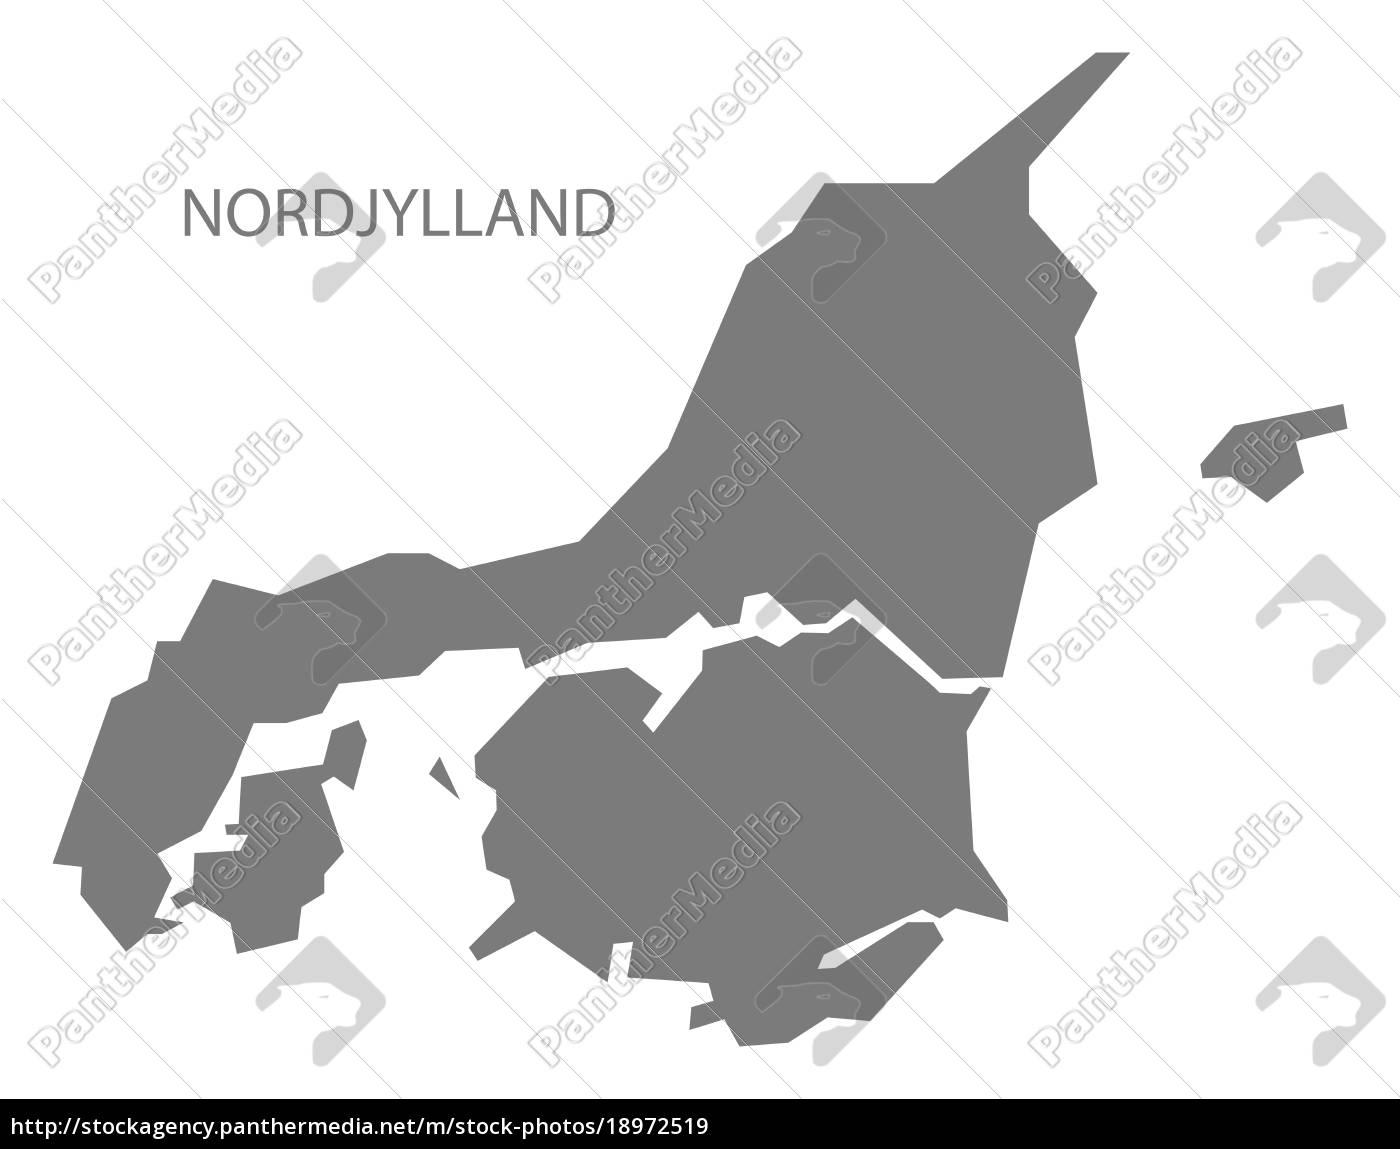 Nordjylland Danmark Kort Gra Stockphoto 18972519